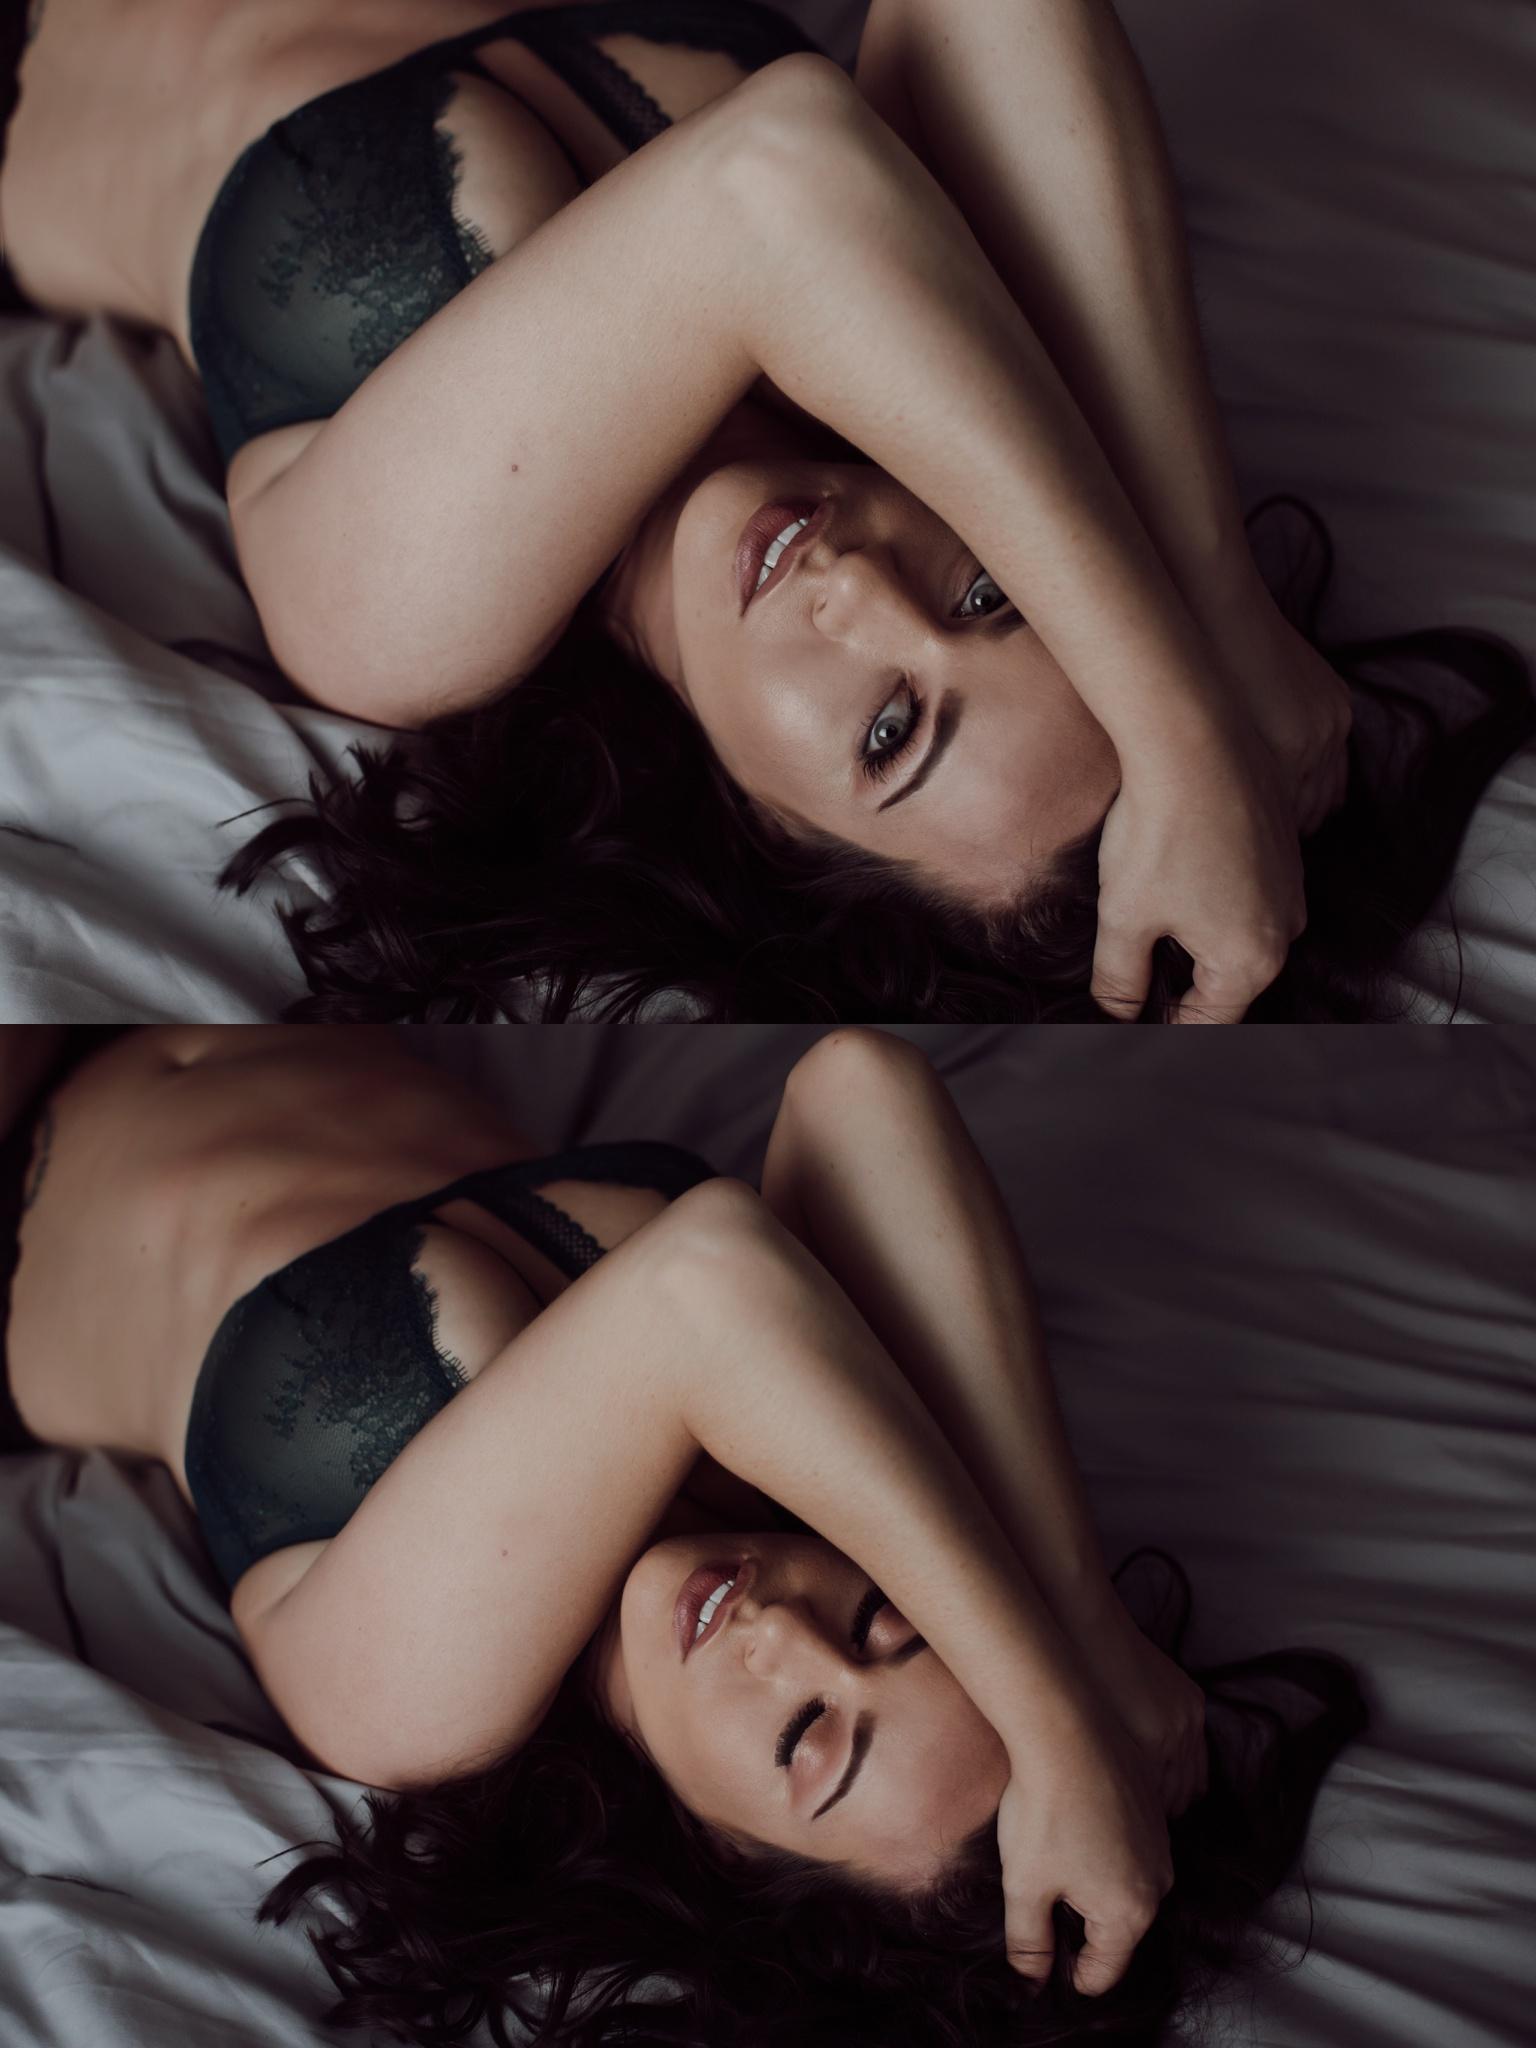 boudoir client bed posing with bra and panties. client testimonials. Sebastian, florida.